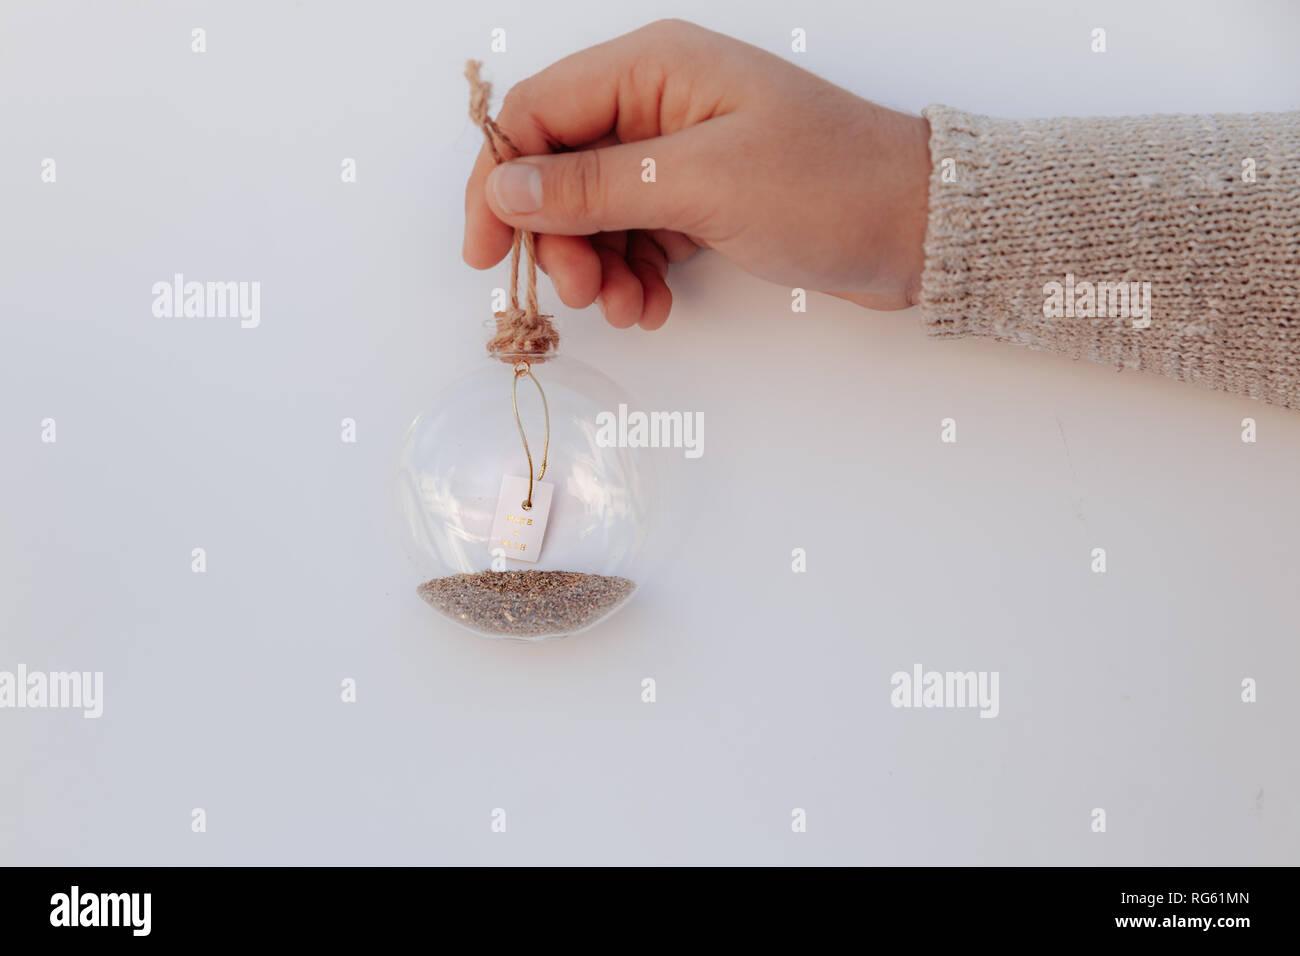 Girl's hand holding a glass bauble avec un message make a wish Banque D'Images